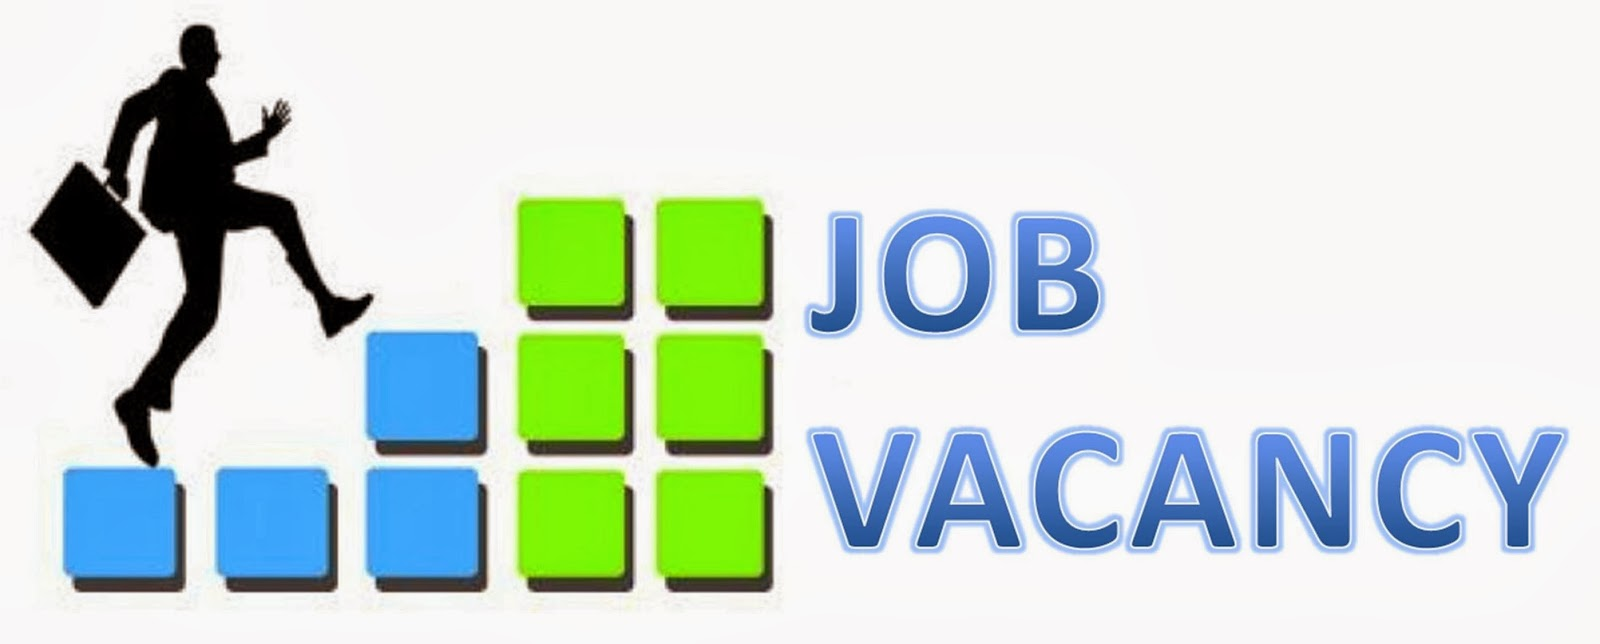 Lowongan Kerja Jawa Tengah Maret 2014 Terbaru